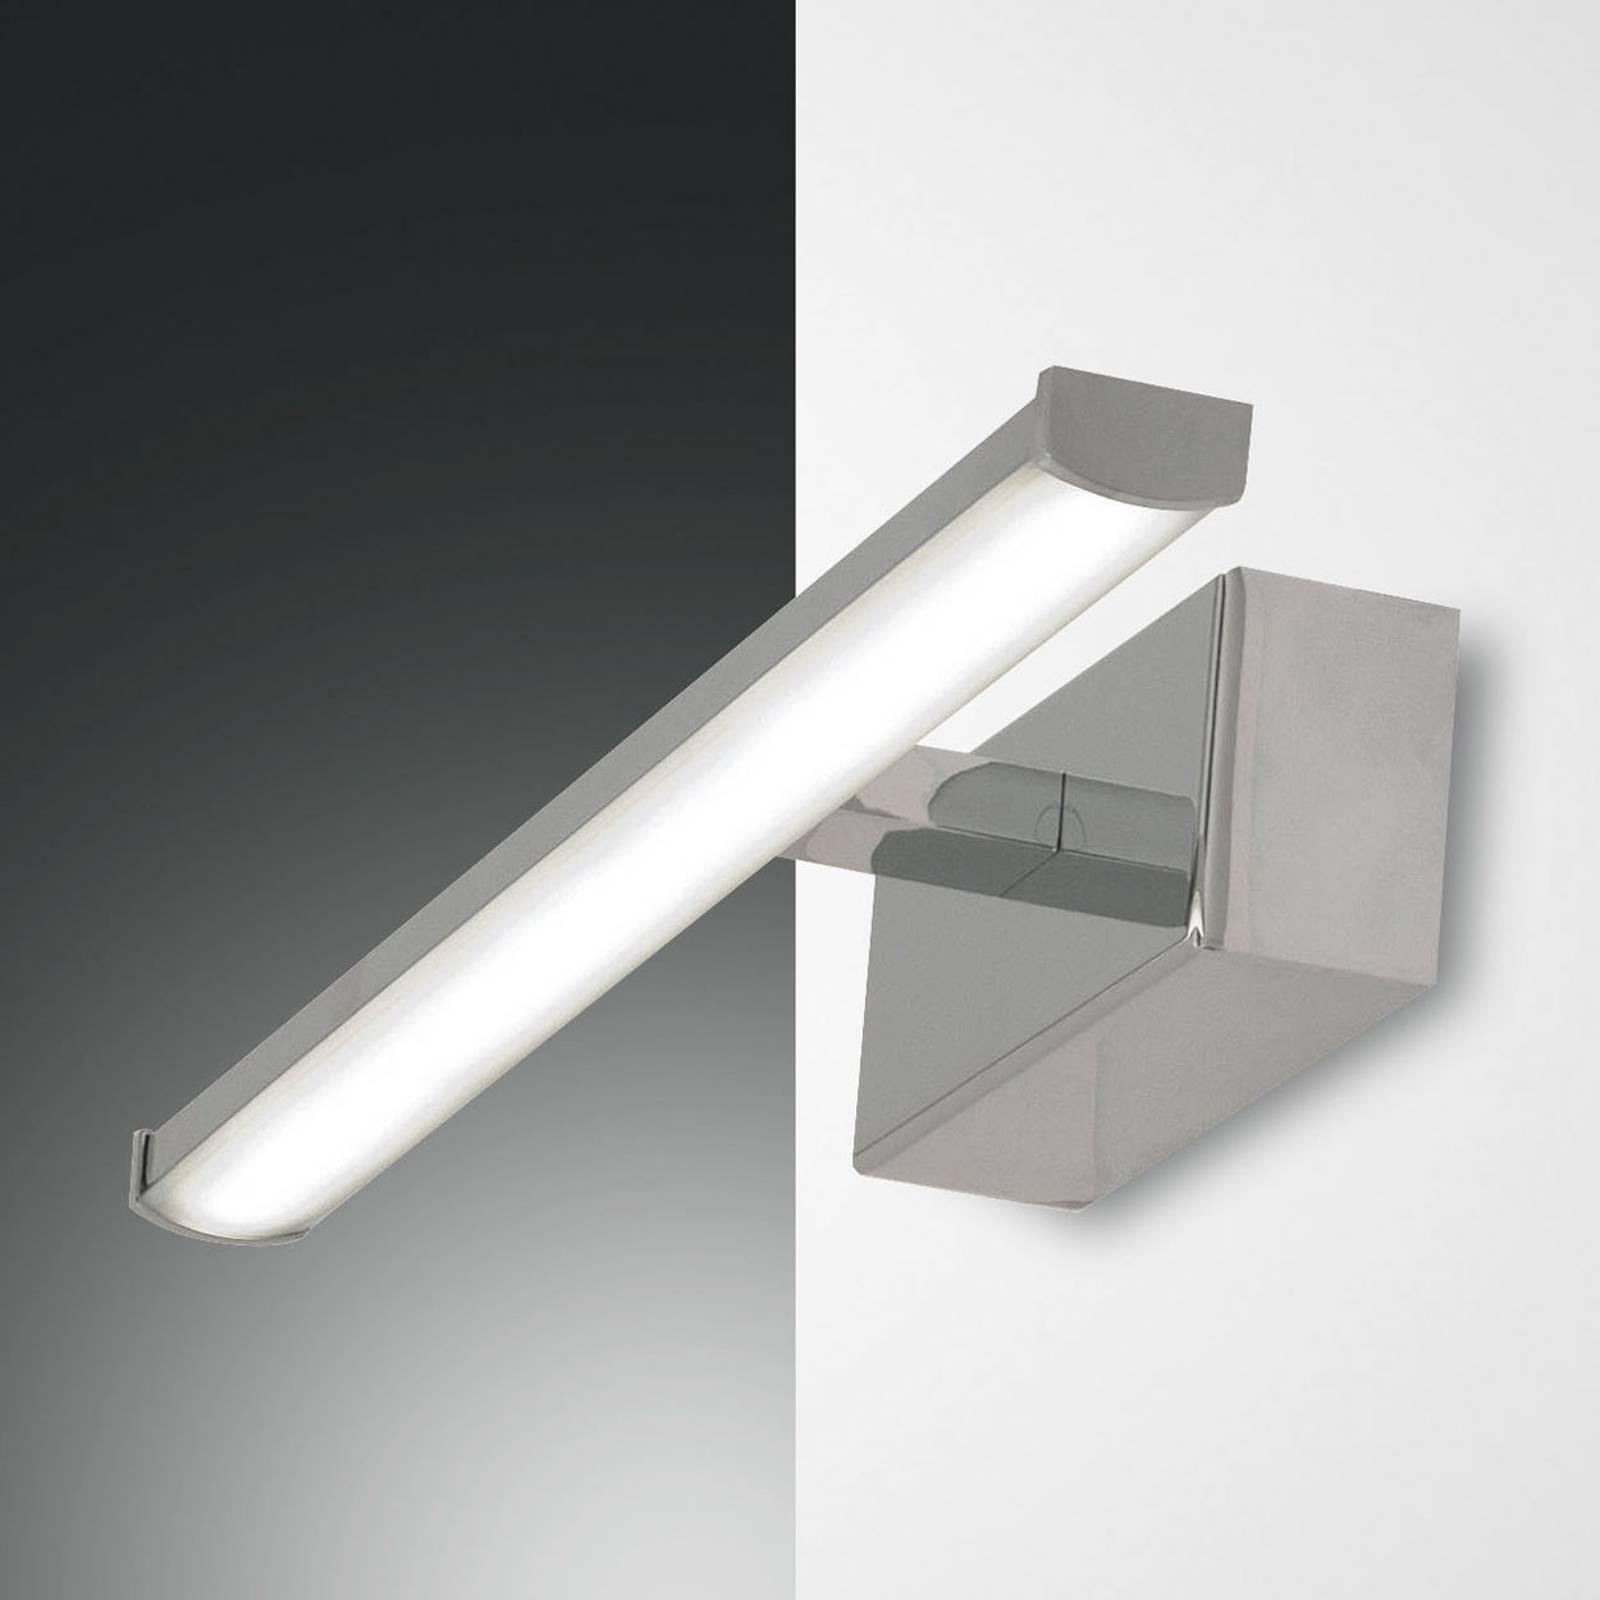 LED-Wandleuchte Nala, chrom, Breite 30 cm